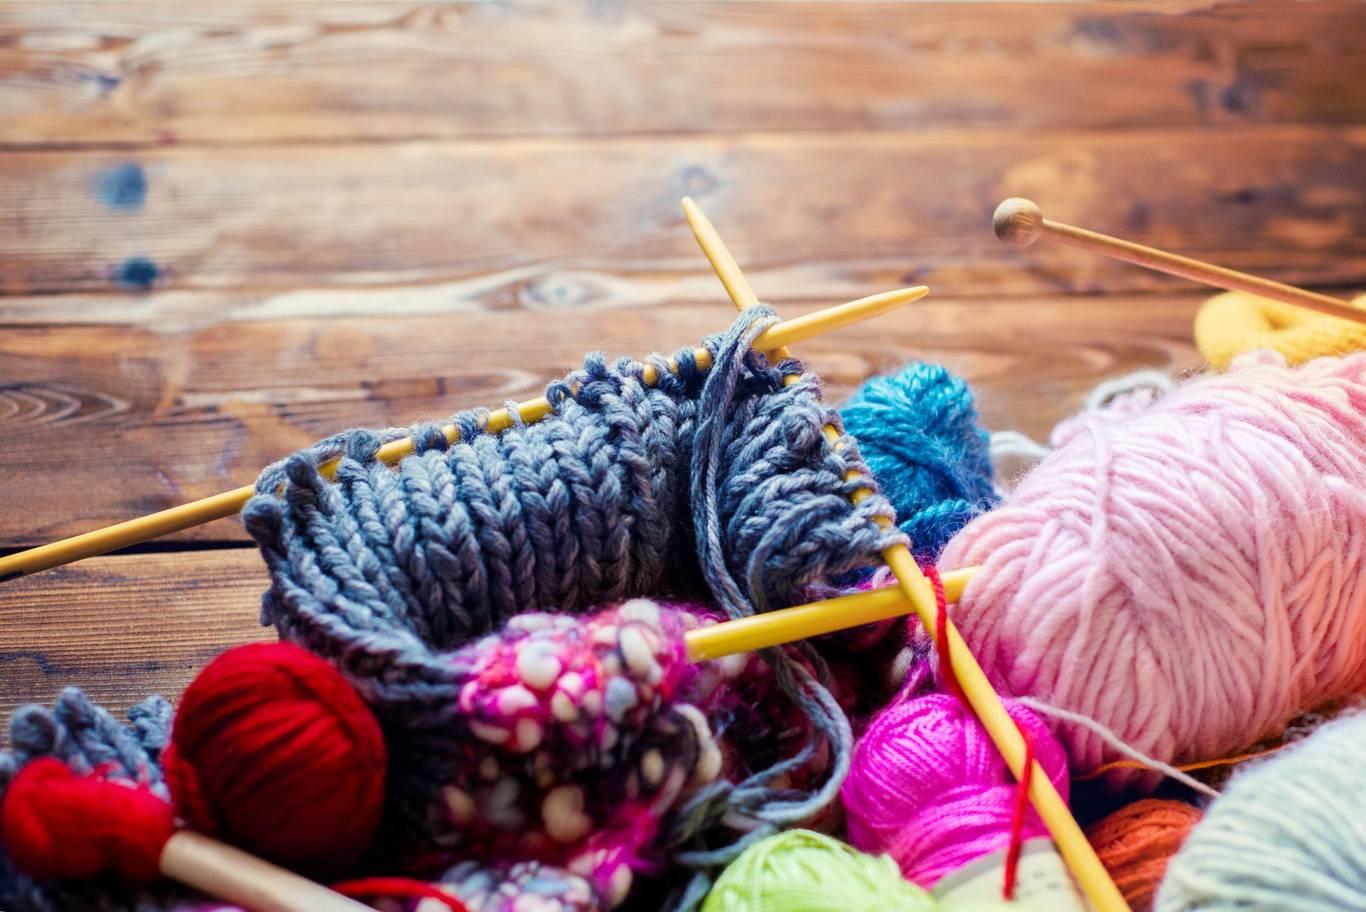 Stock photo of knitting needles and yarn